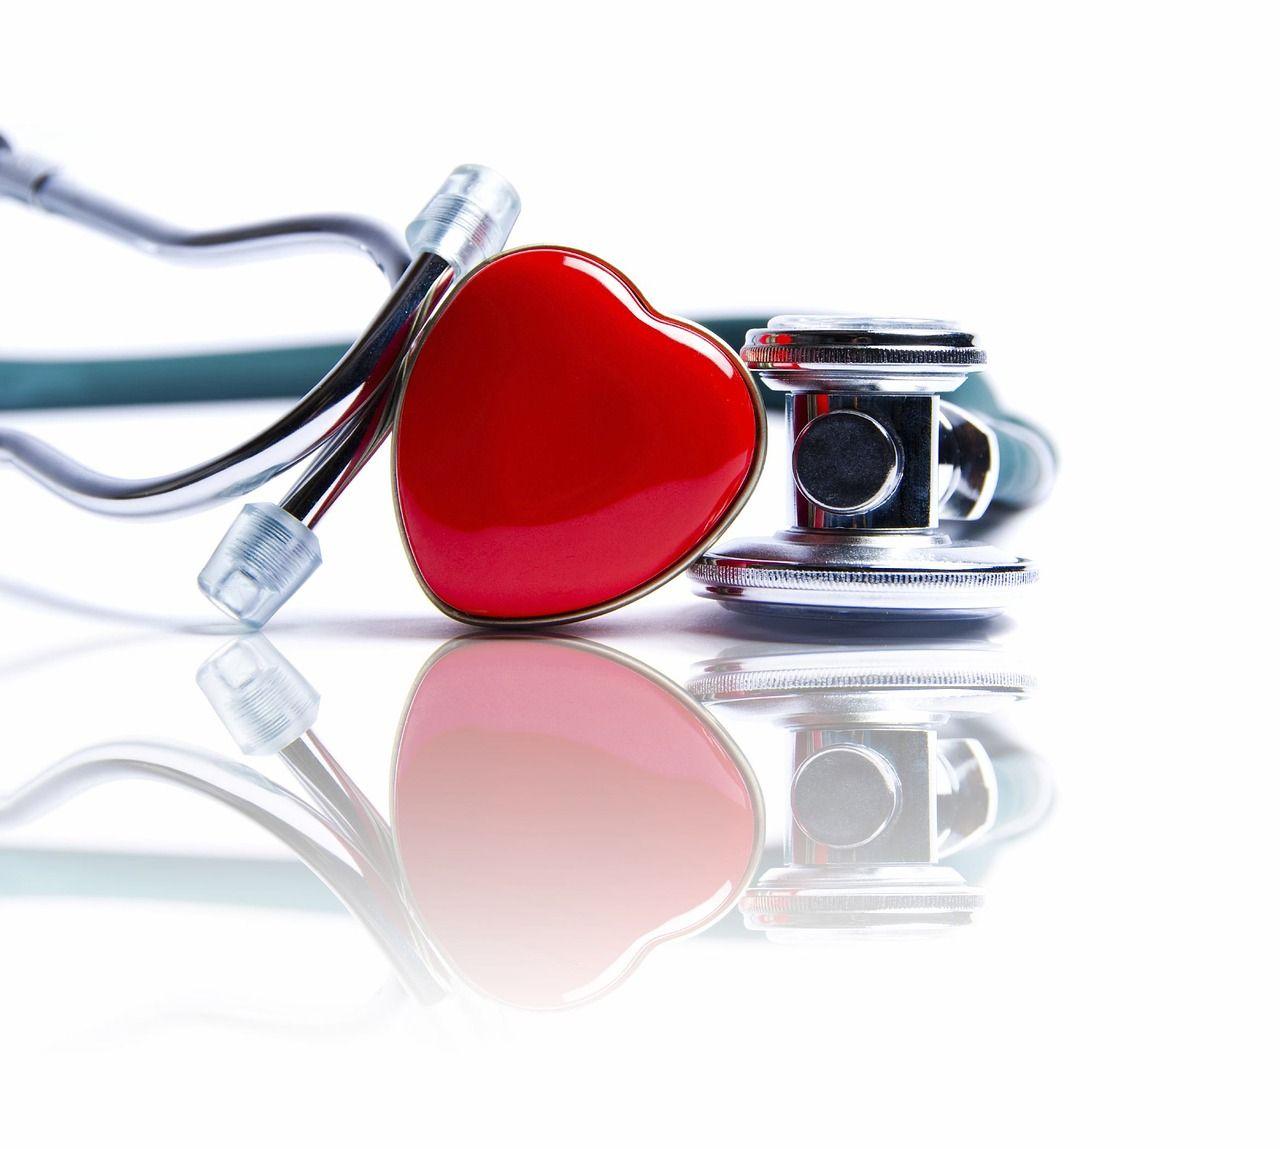 medycyna-serce-stetoskop